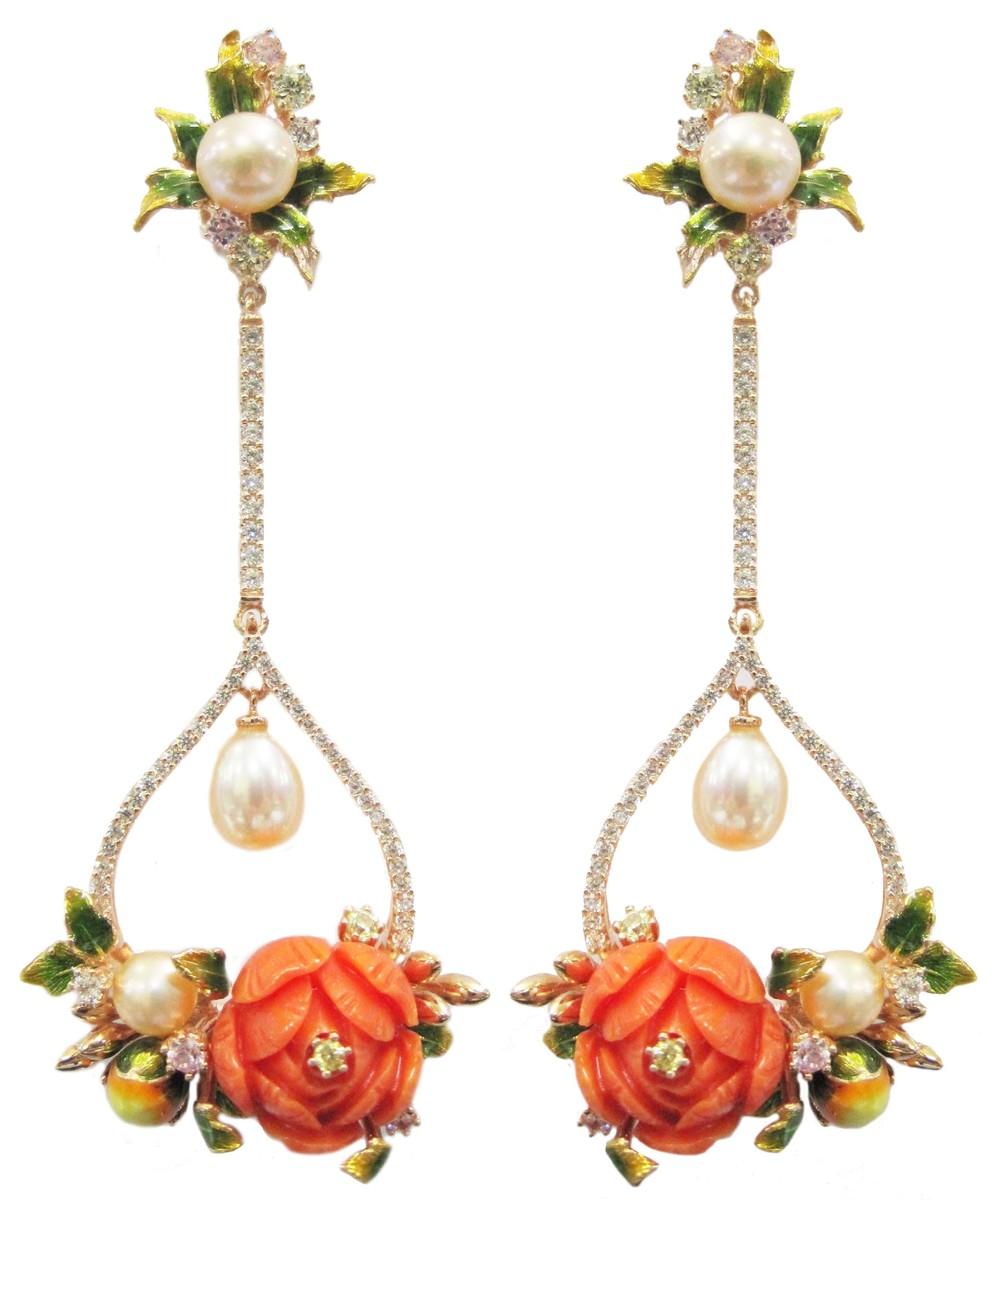 Style Avenue | Camarillo CA | Van Gundys Jewelers